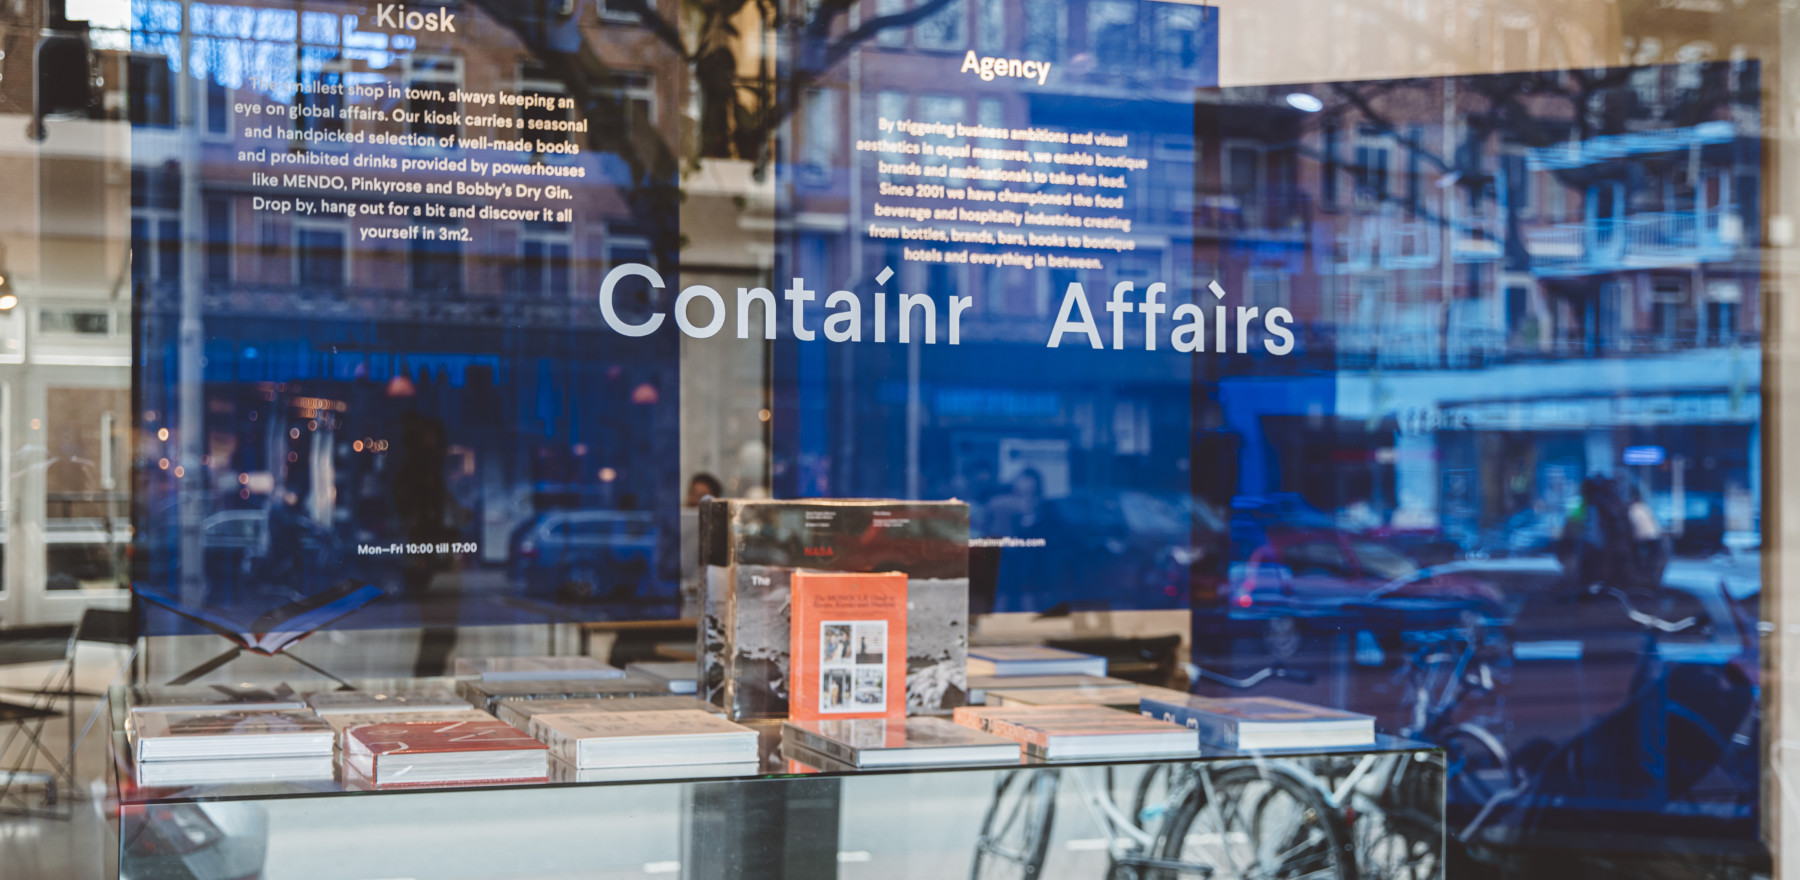 Containr Affairs